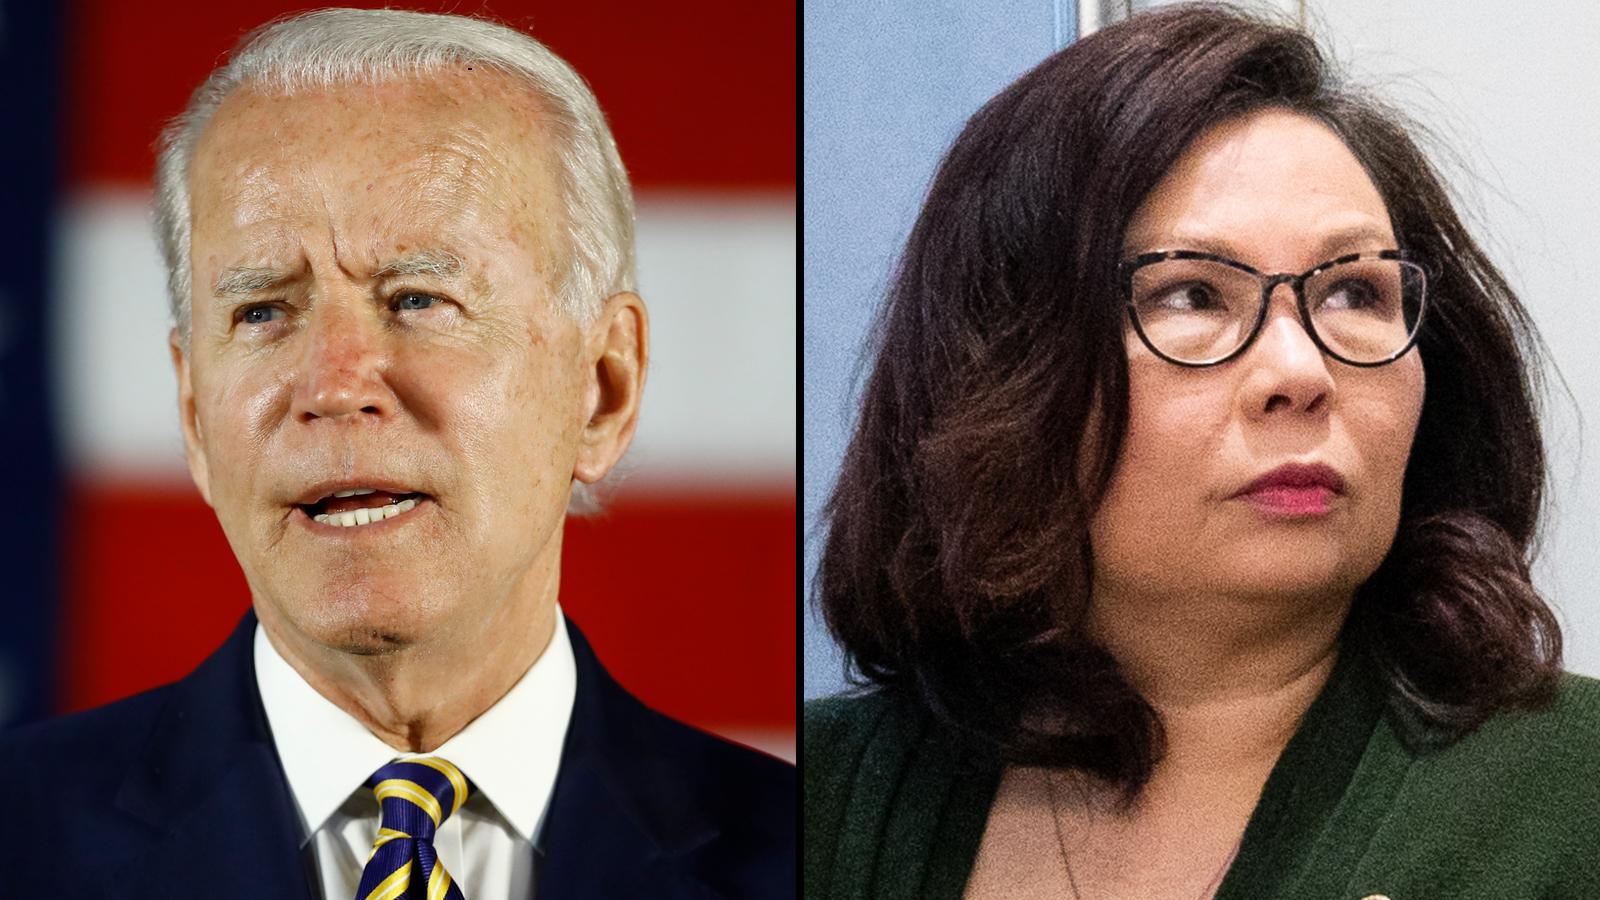 Biden defends Duckworth amid attacks on her patriotism